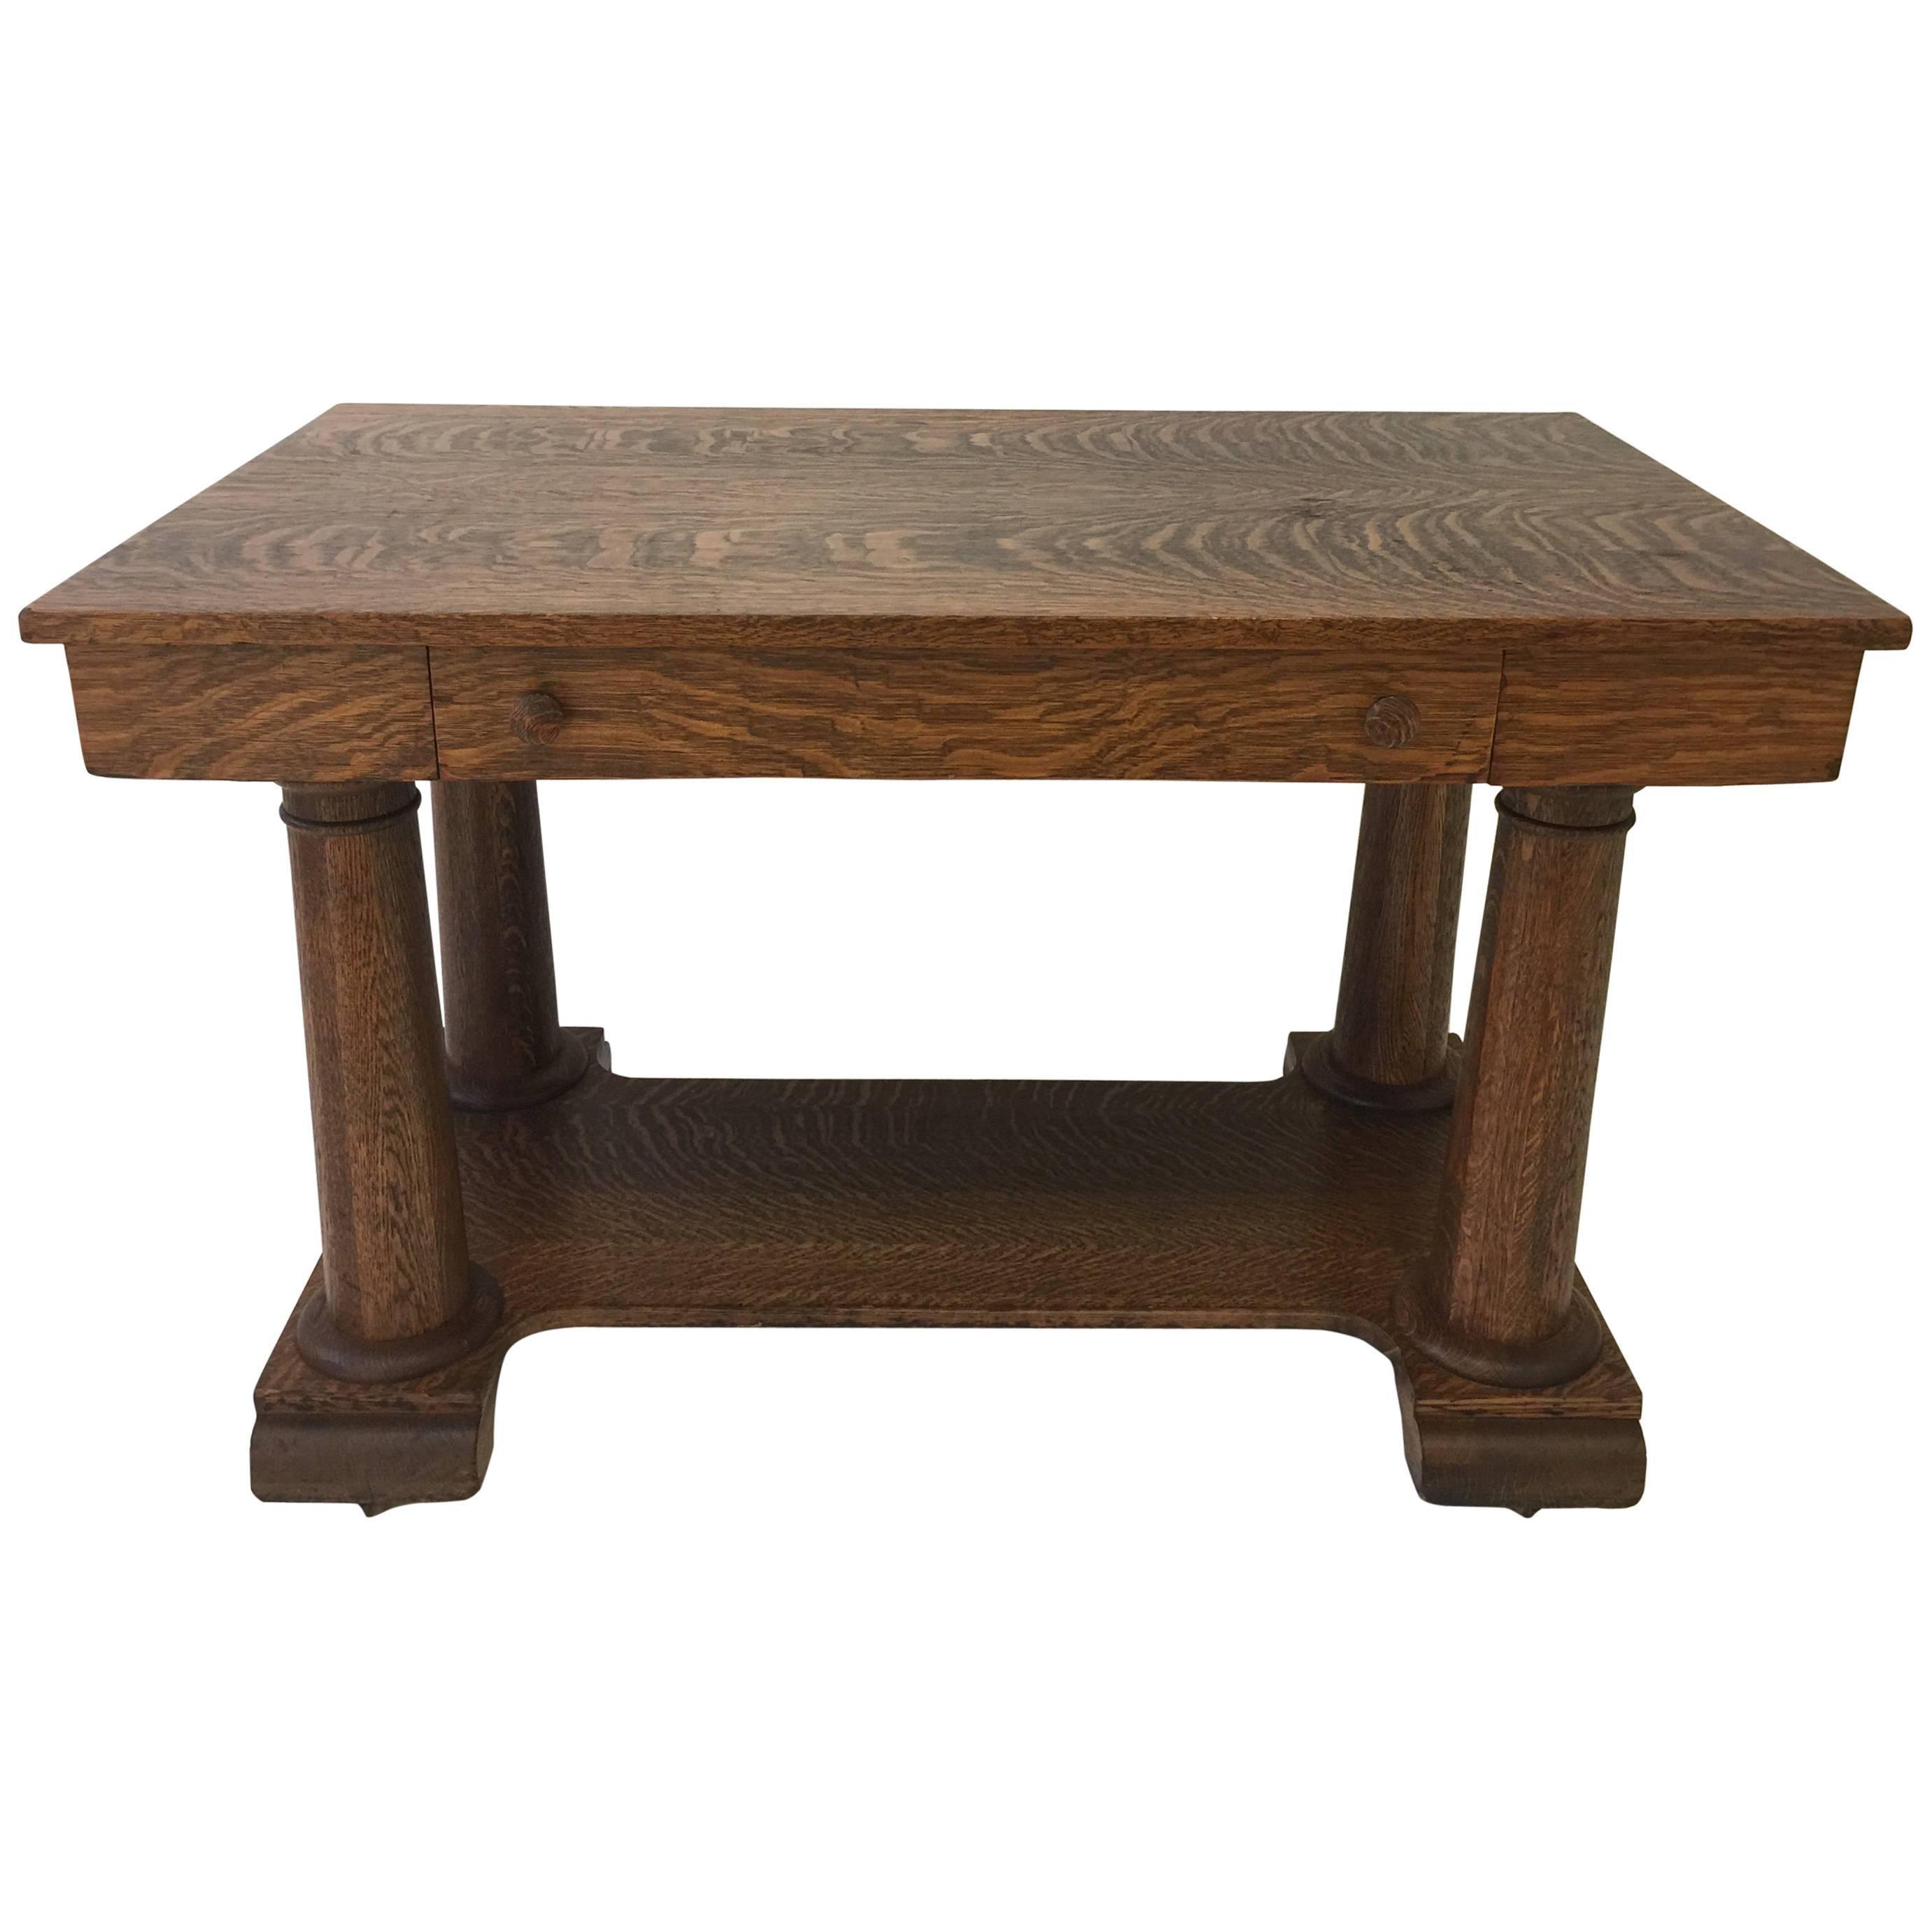 Tiger Maple Arts & Crafts Desk or Table